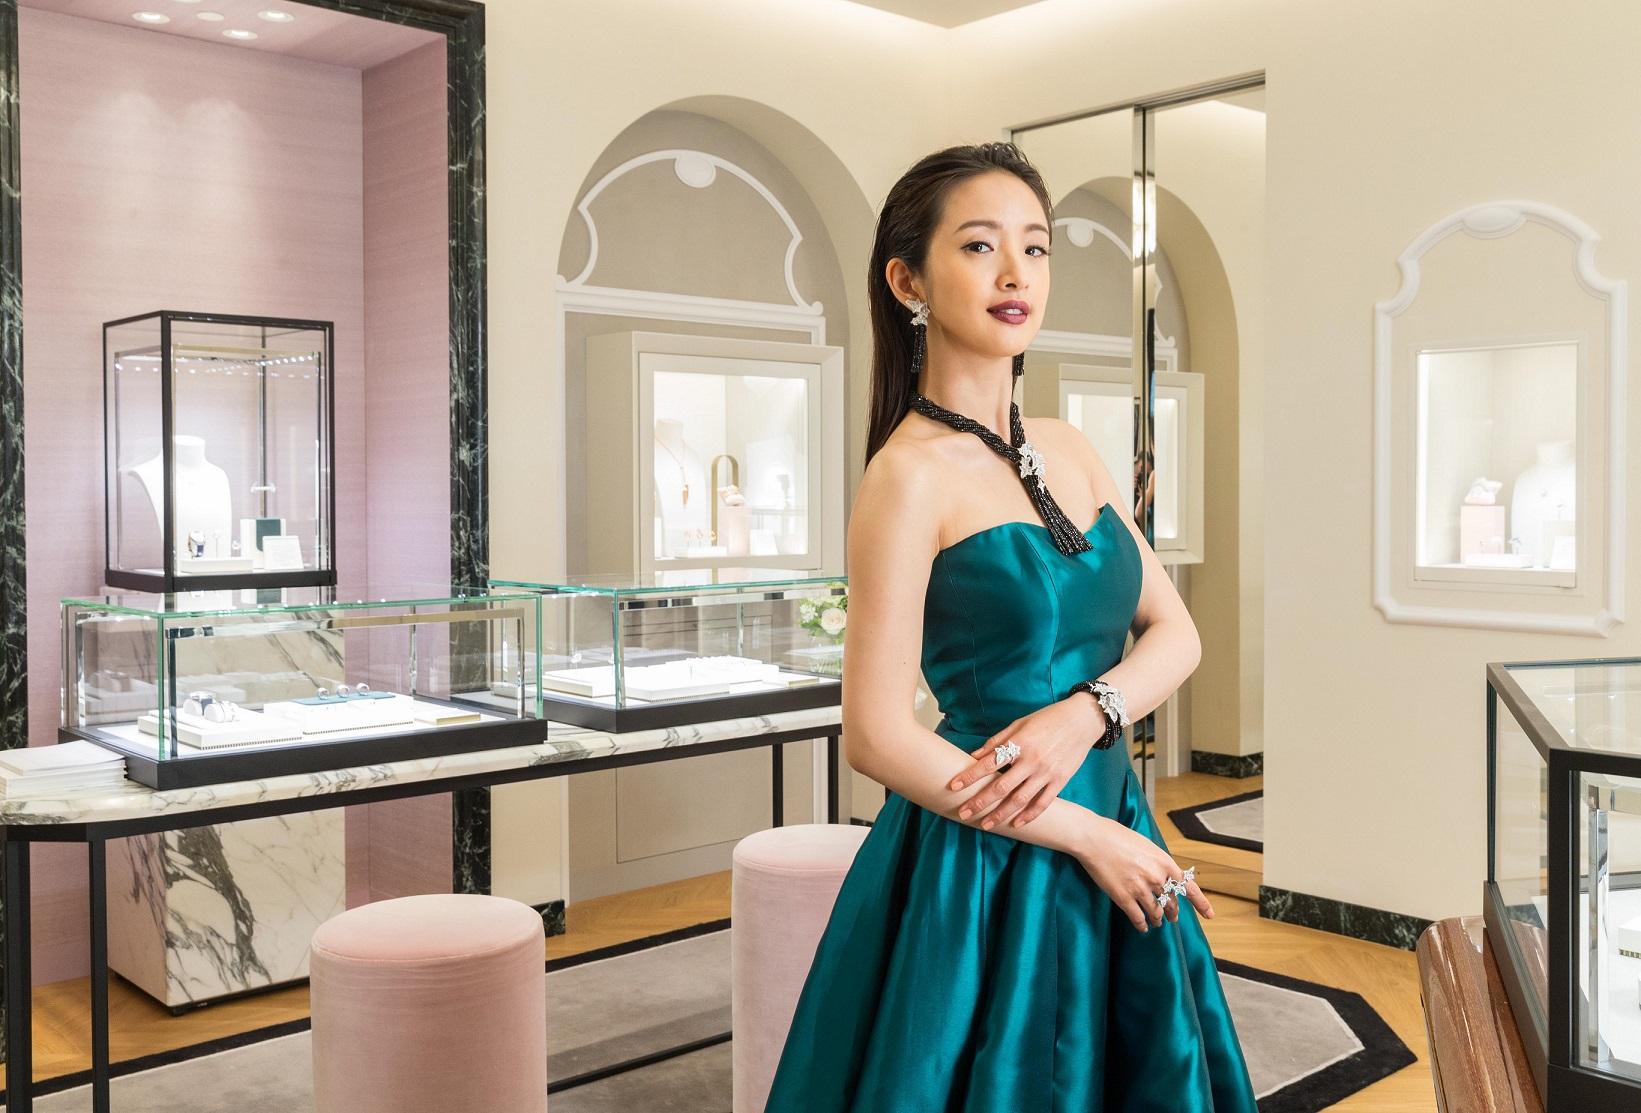 inculture 作品 法國頂級珠寶品牌BOUCHERON 微風廣場精品店盛大開幕